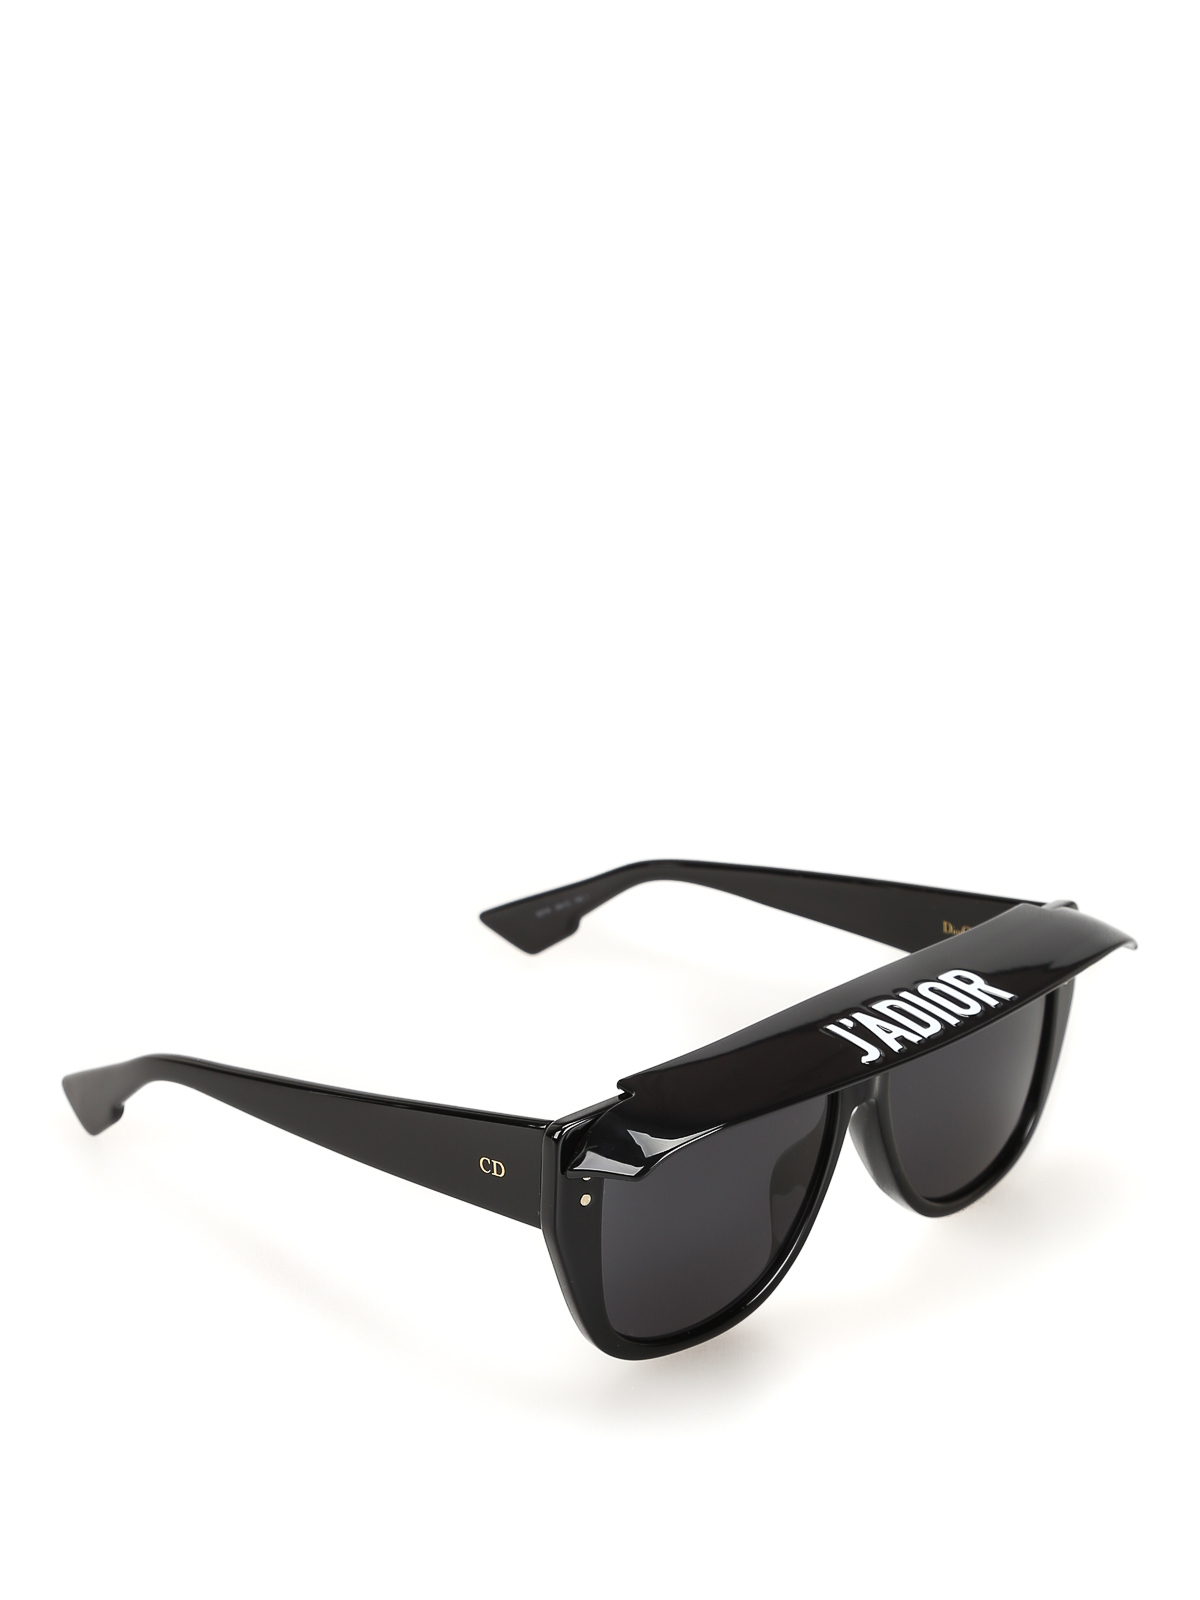 Dior Club2 Sunglasses With Visor In Black